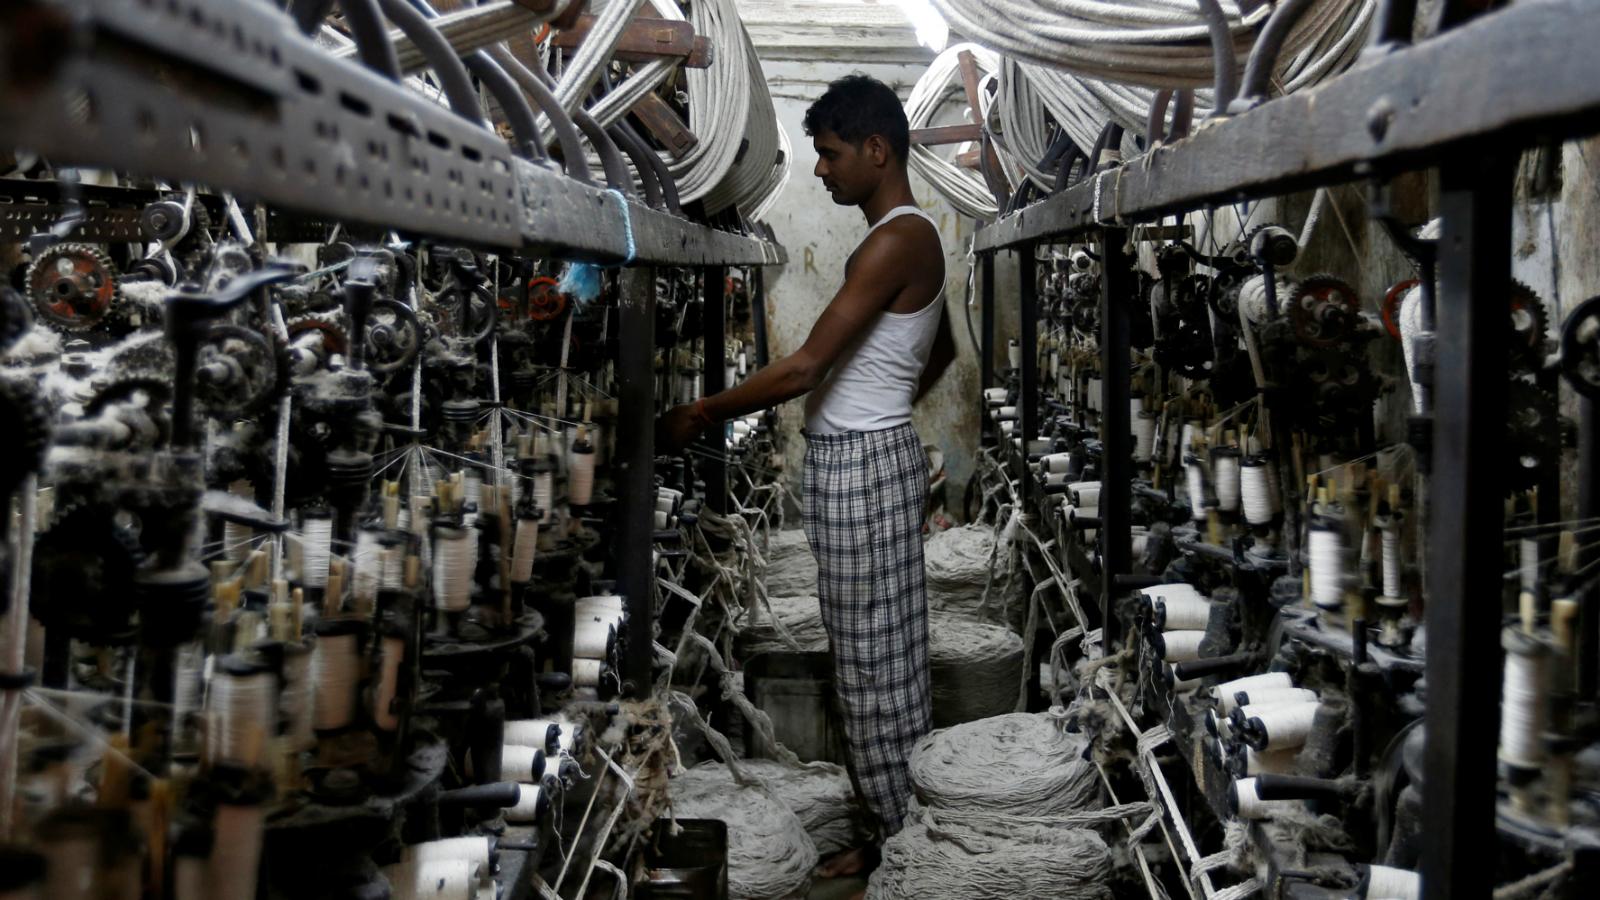 An employee works inside a garment factory in Mumbai, India February 28, 2017.